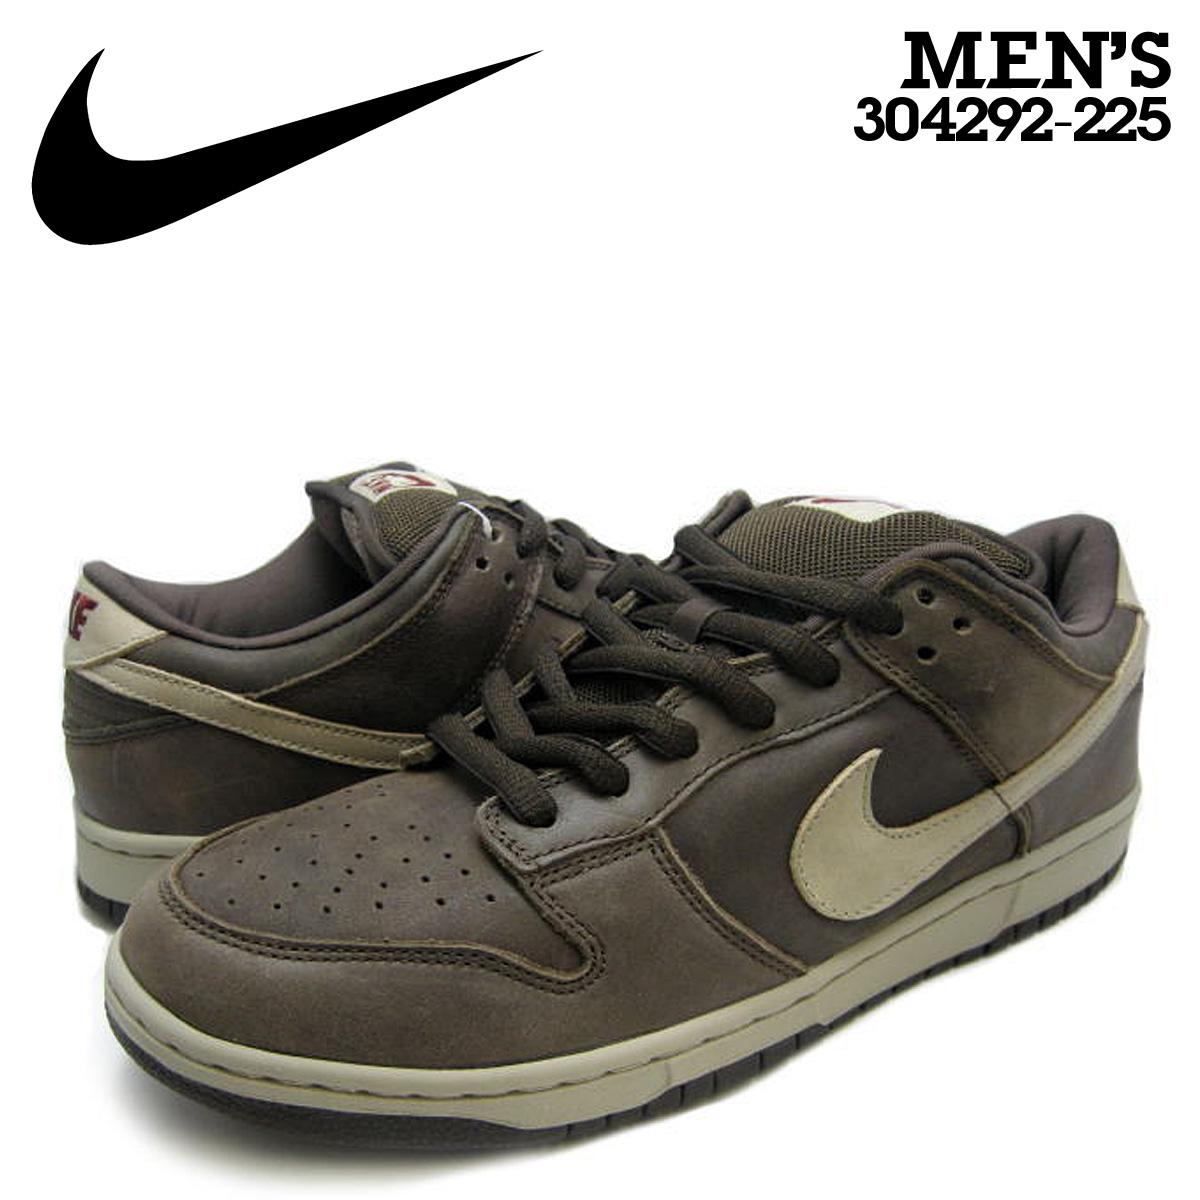 cheaper 561fa eeec8 3d328 8db15  italy nike nike dunk sneakers dunk low pro sb moca dunk low pro  sb 304292 225